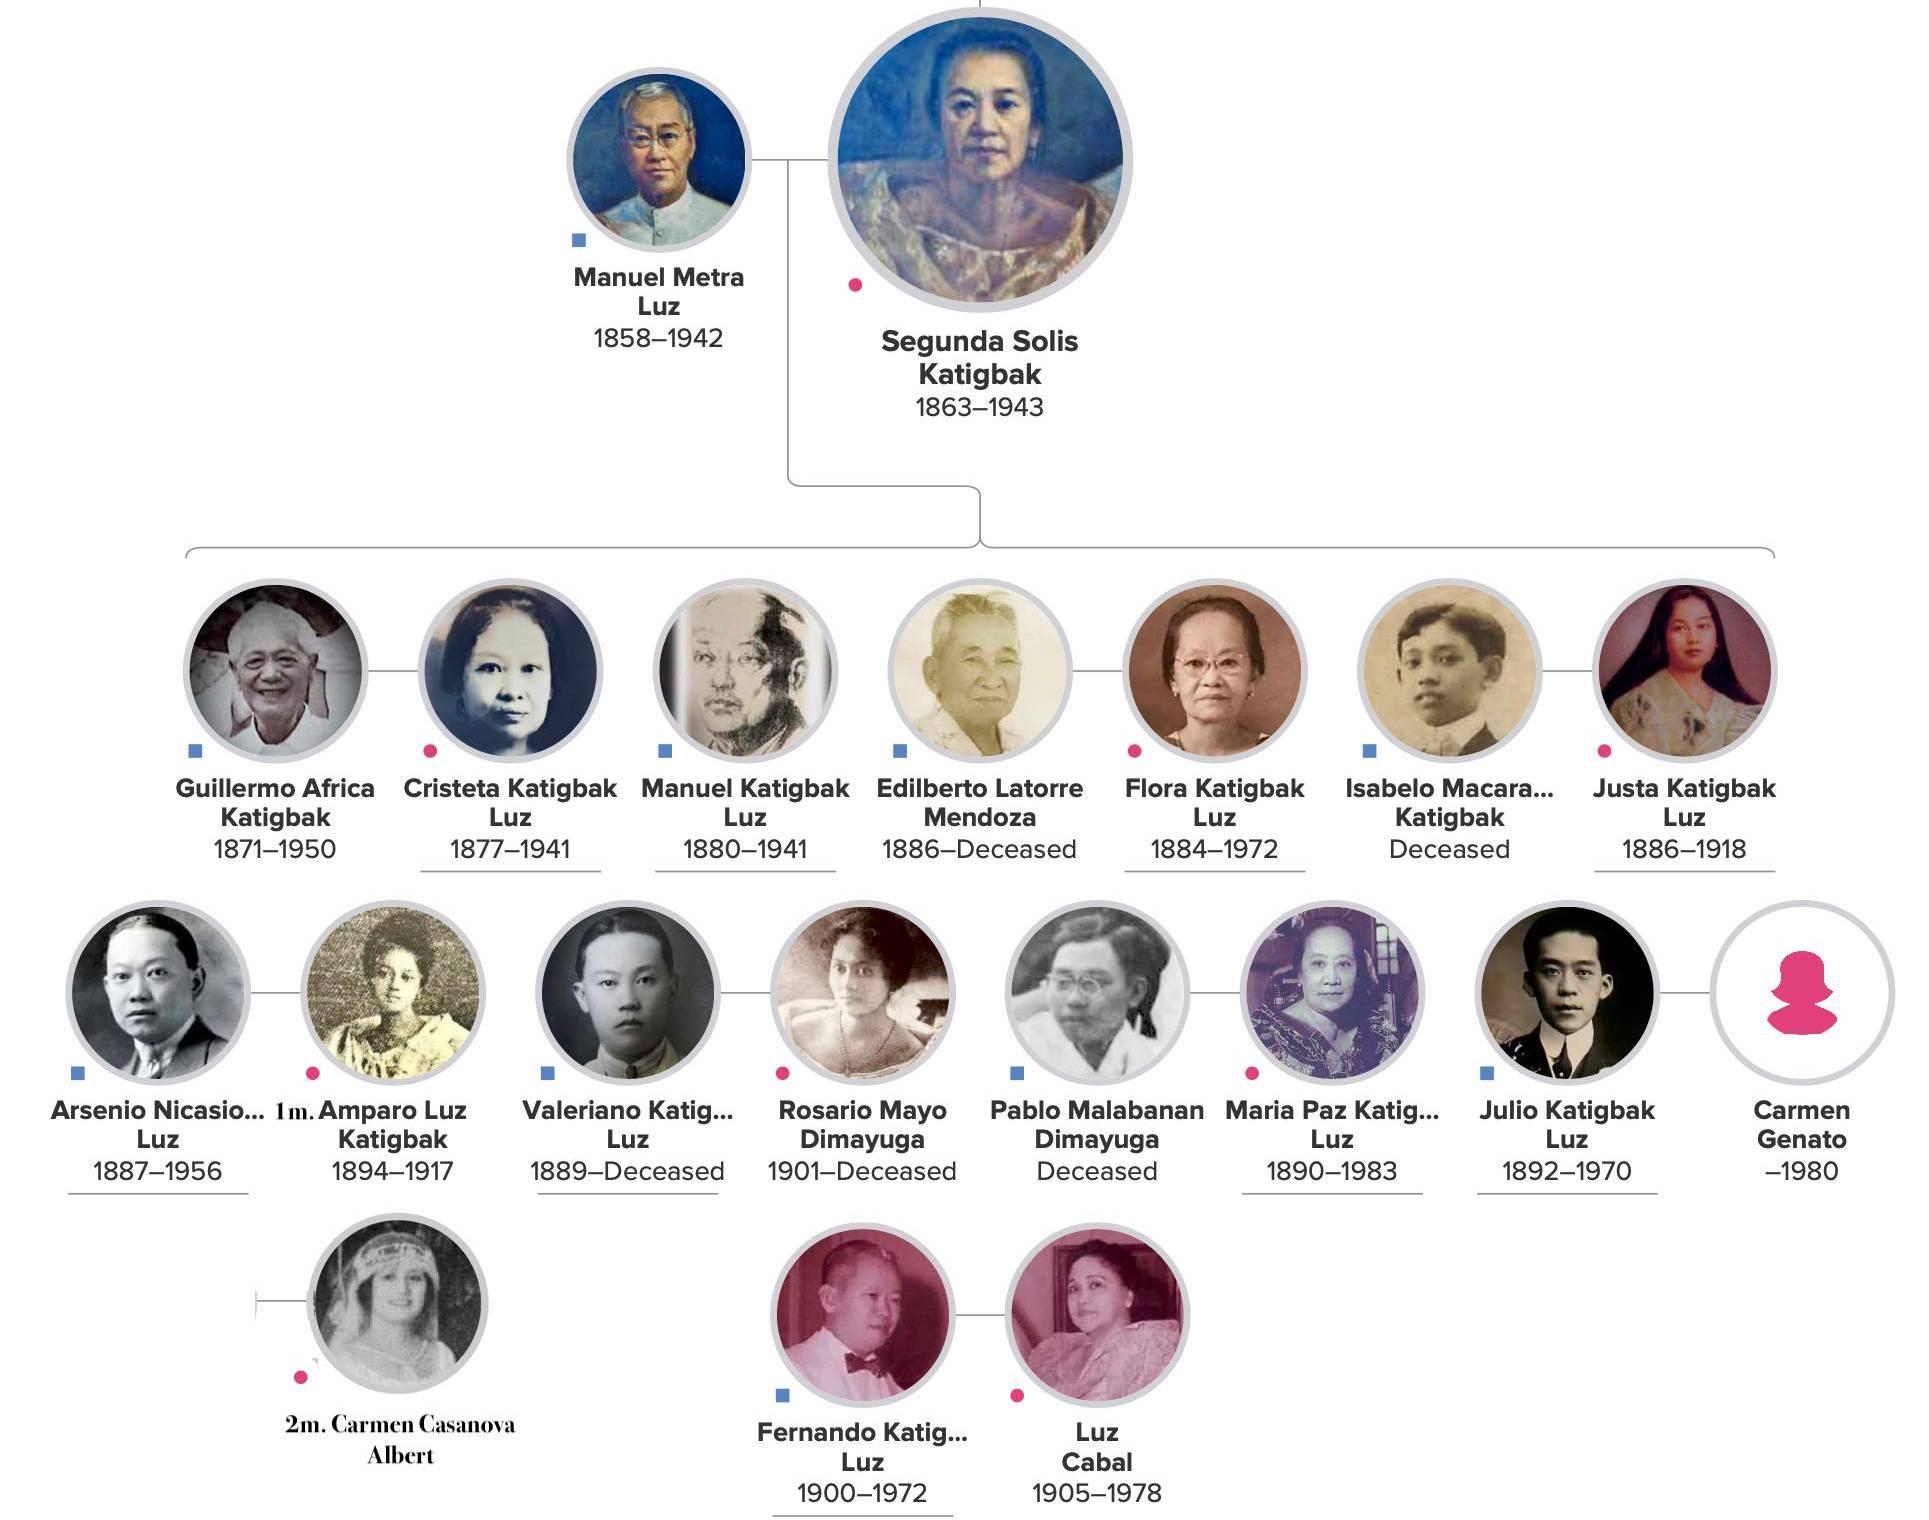 Segunda S Katigbak and Manuel Luz Family Tree